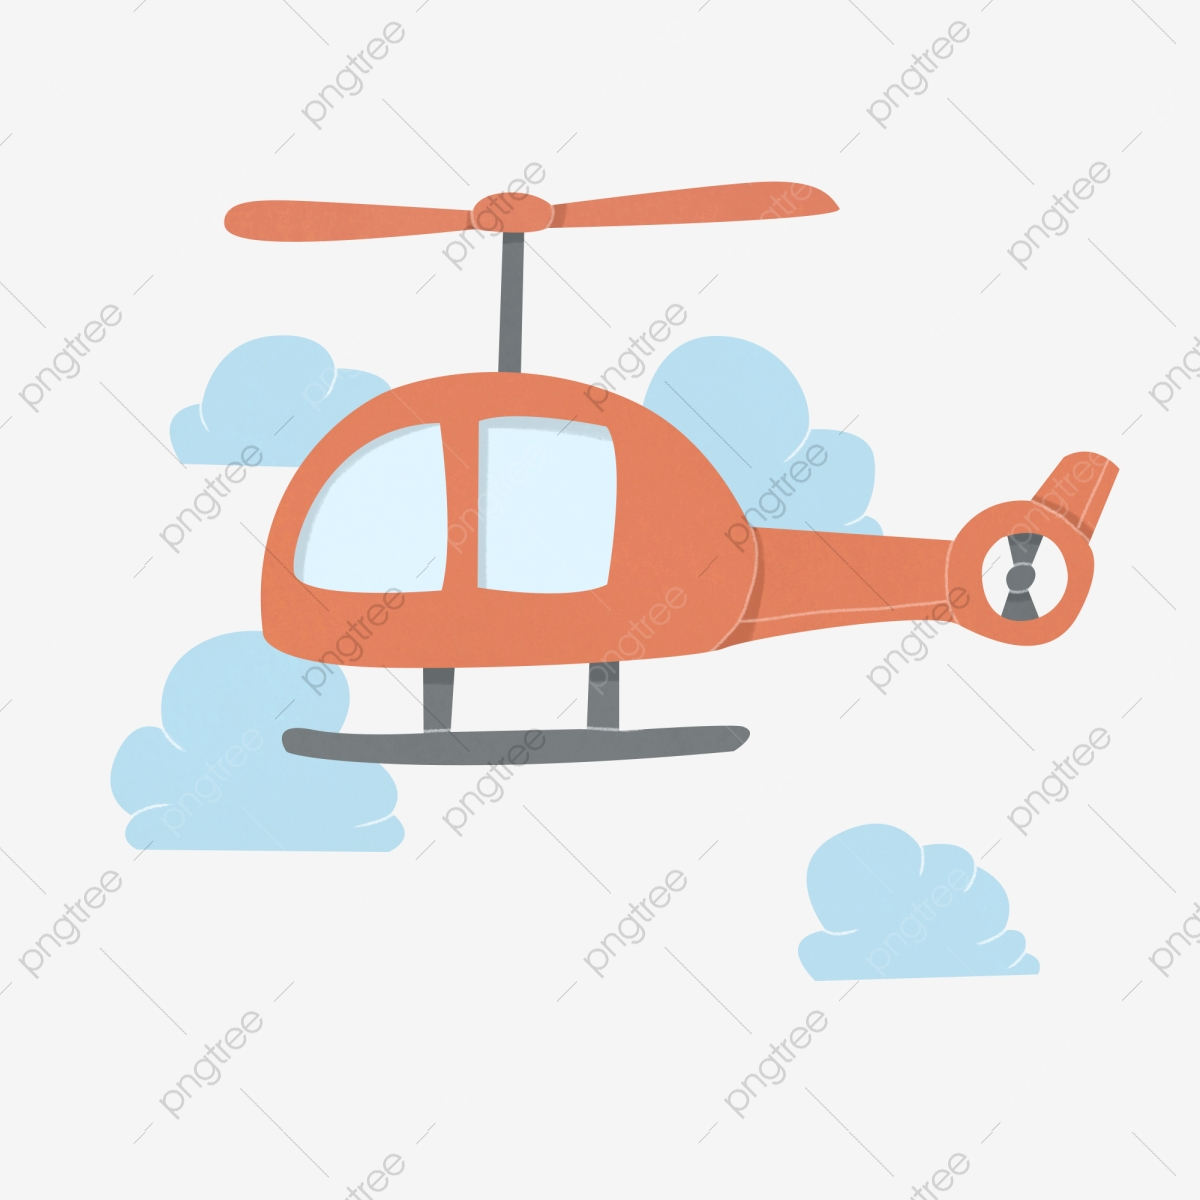 Pesawat Contoh Helikopter Ilustrasi Helikopter Kartun Awan